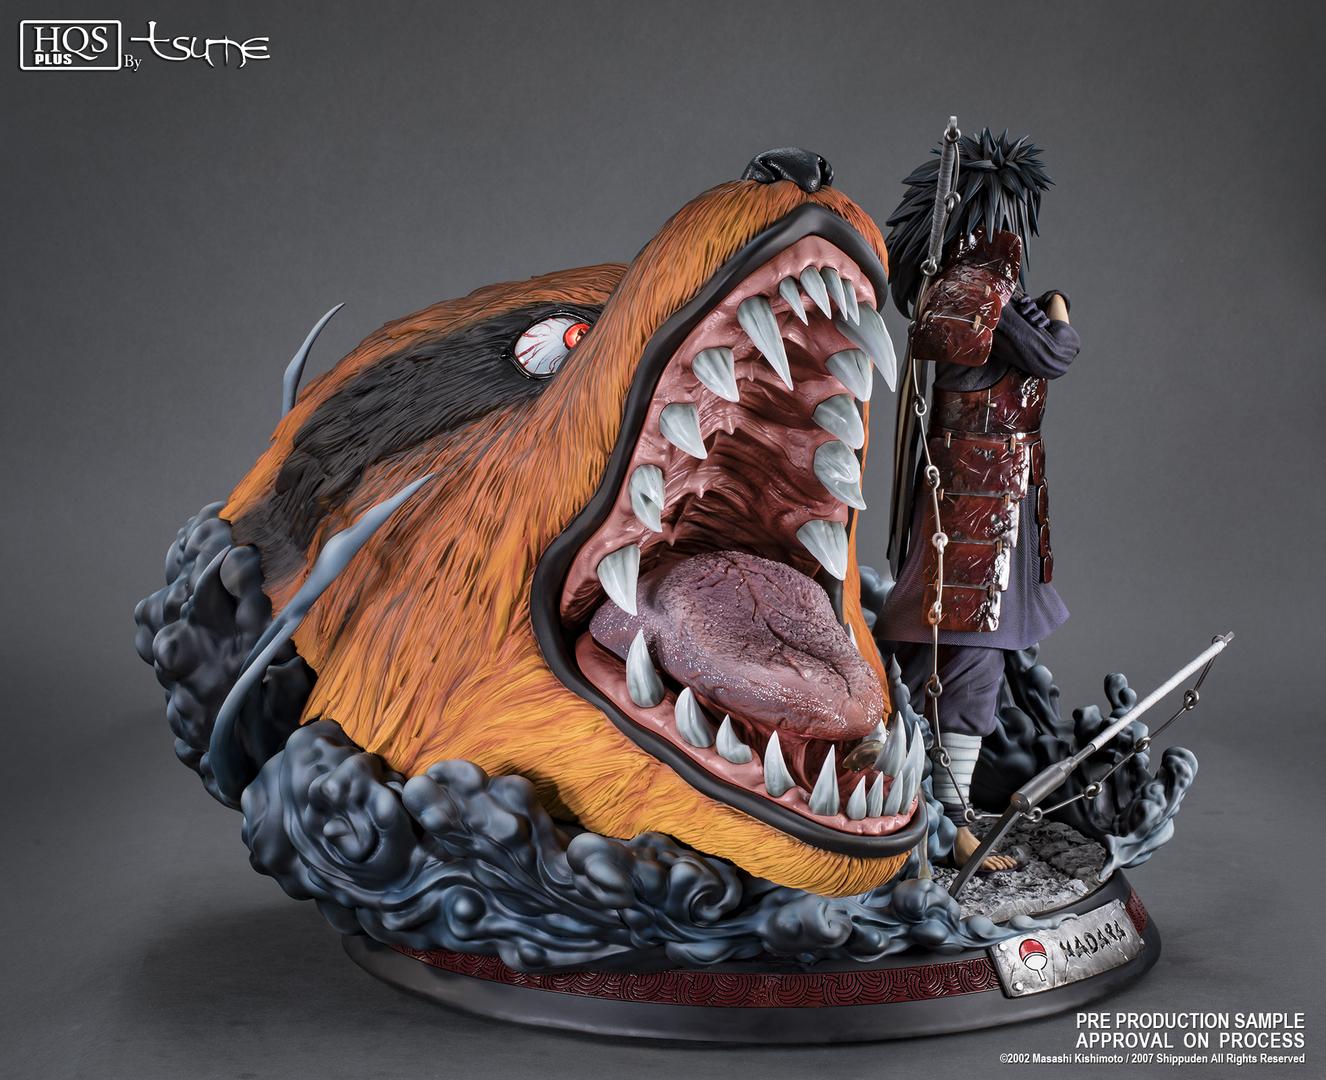 Statue Naruto Shippuden Madara Uchiha HQS+ by Tsume 1001 Figurines 9